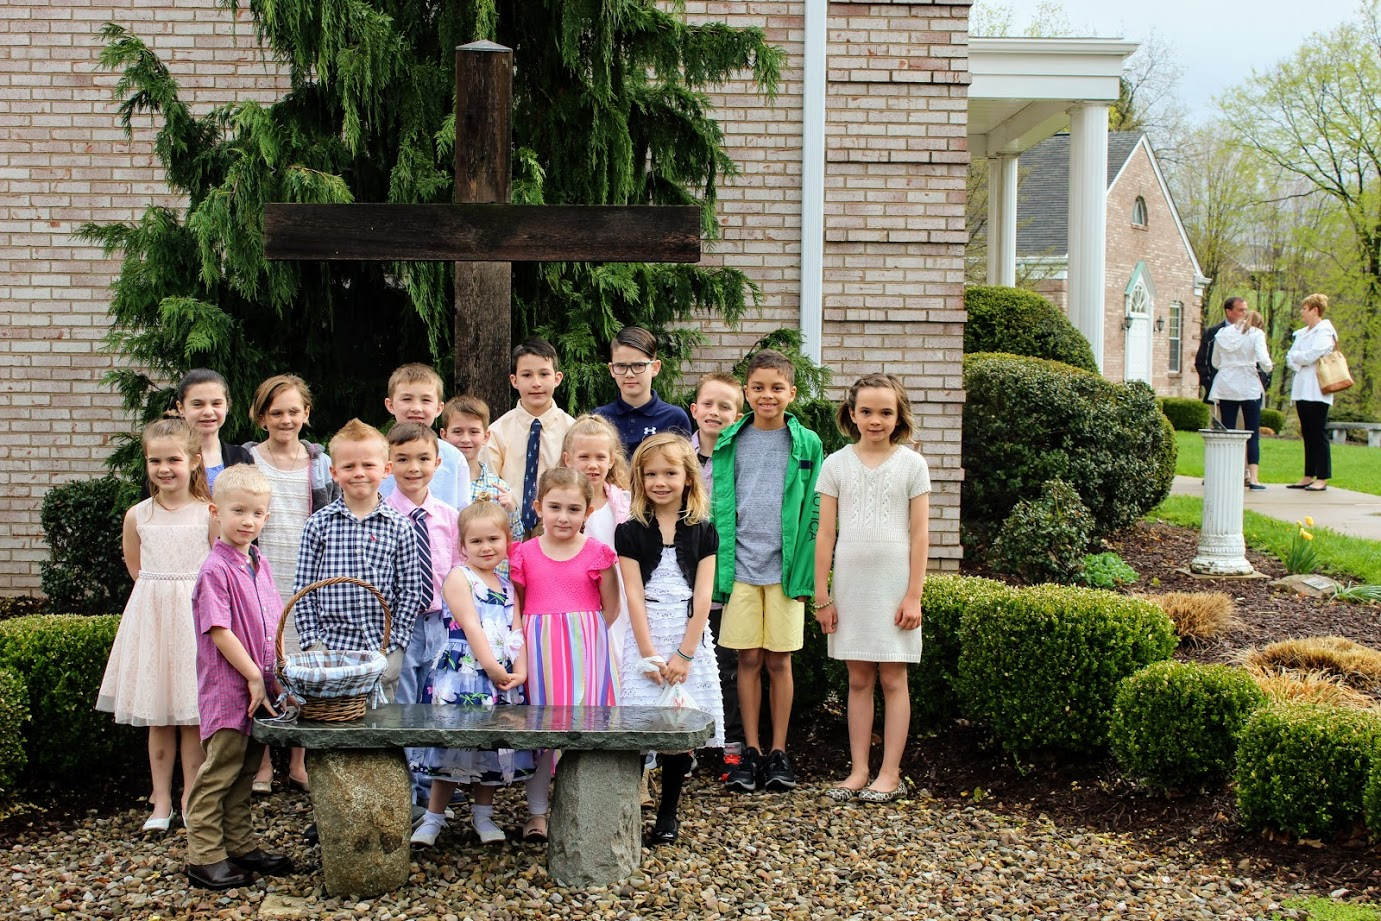 Easter cross with kids.JPG